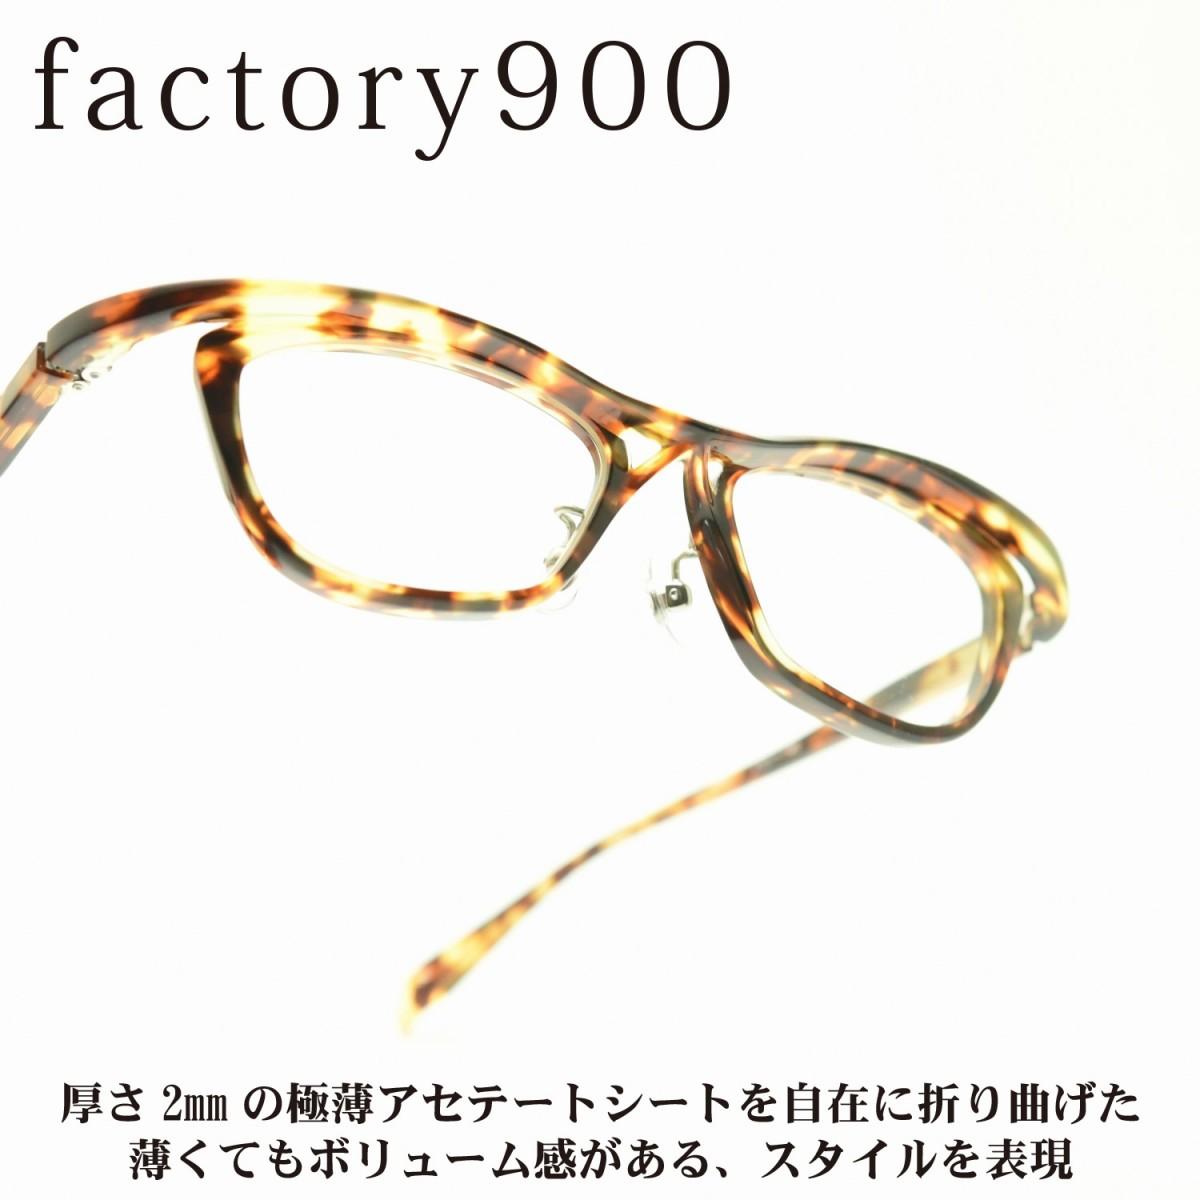 factory900 ファクトリー900FA-2032 col-159